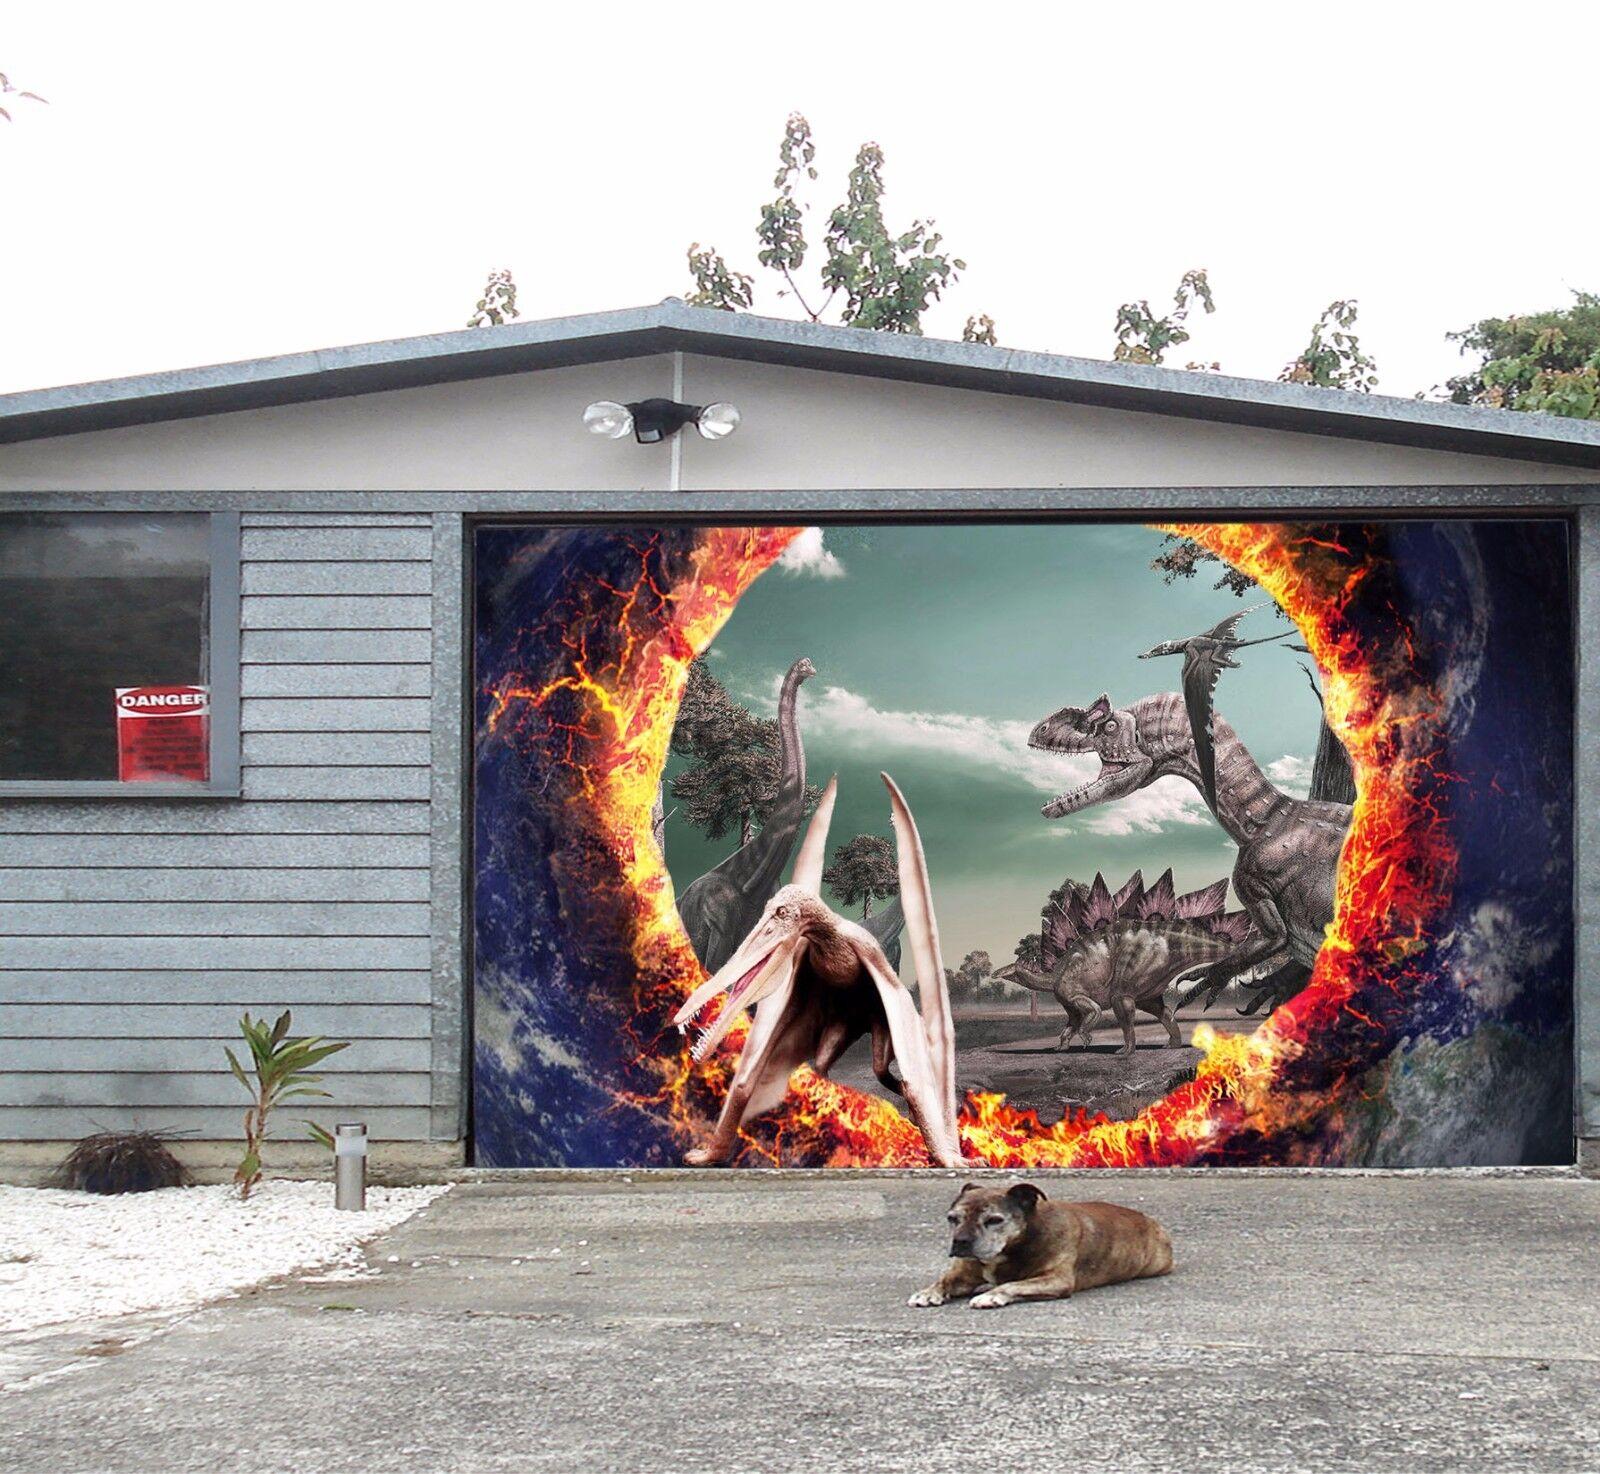 3D Dinosaur 864 Garage Door Murals Wall Print Decal Wall AJ WALLPAPER UK Carly  sc 1 st  Collectionpolestar.top & 3D Dinosaur 864 Garage Door Murals Wall Print Decal Wall AJ ...